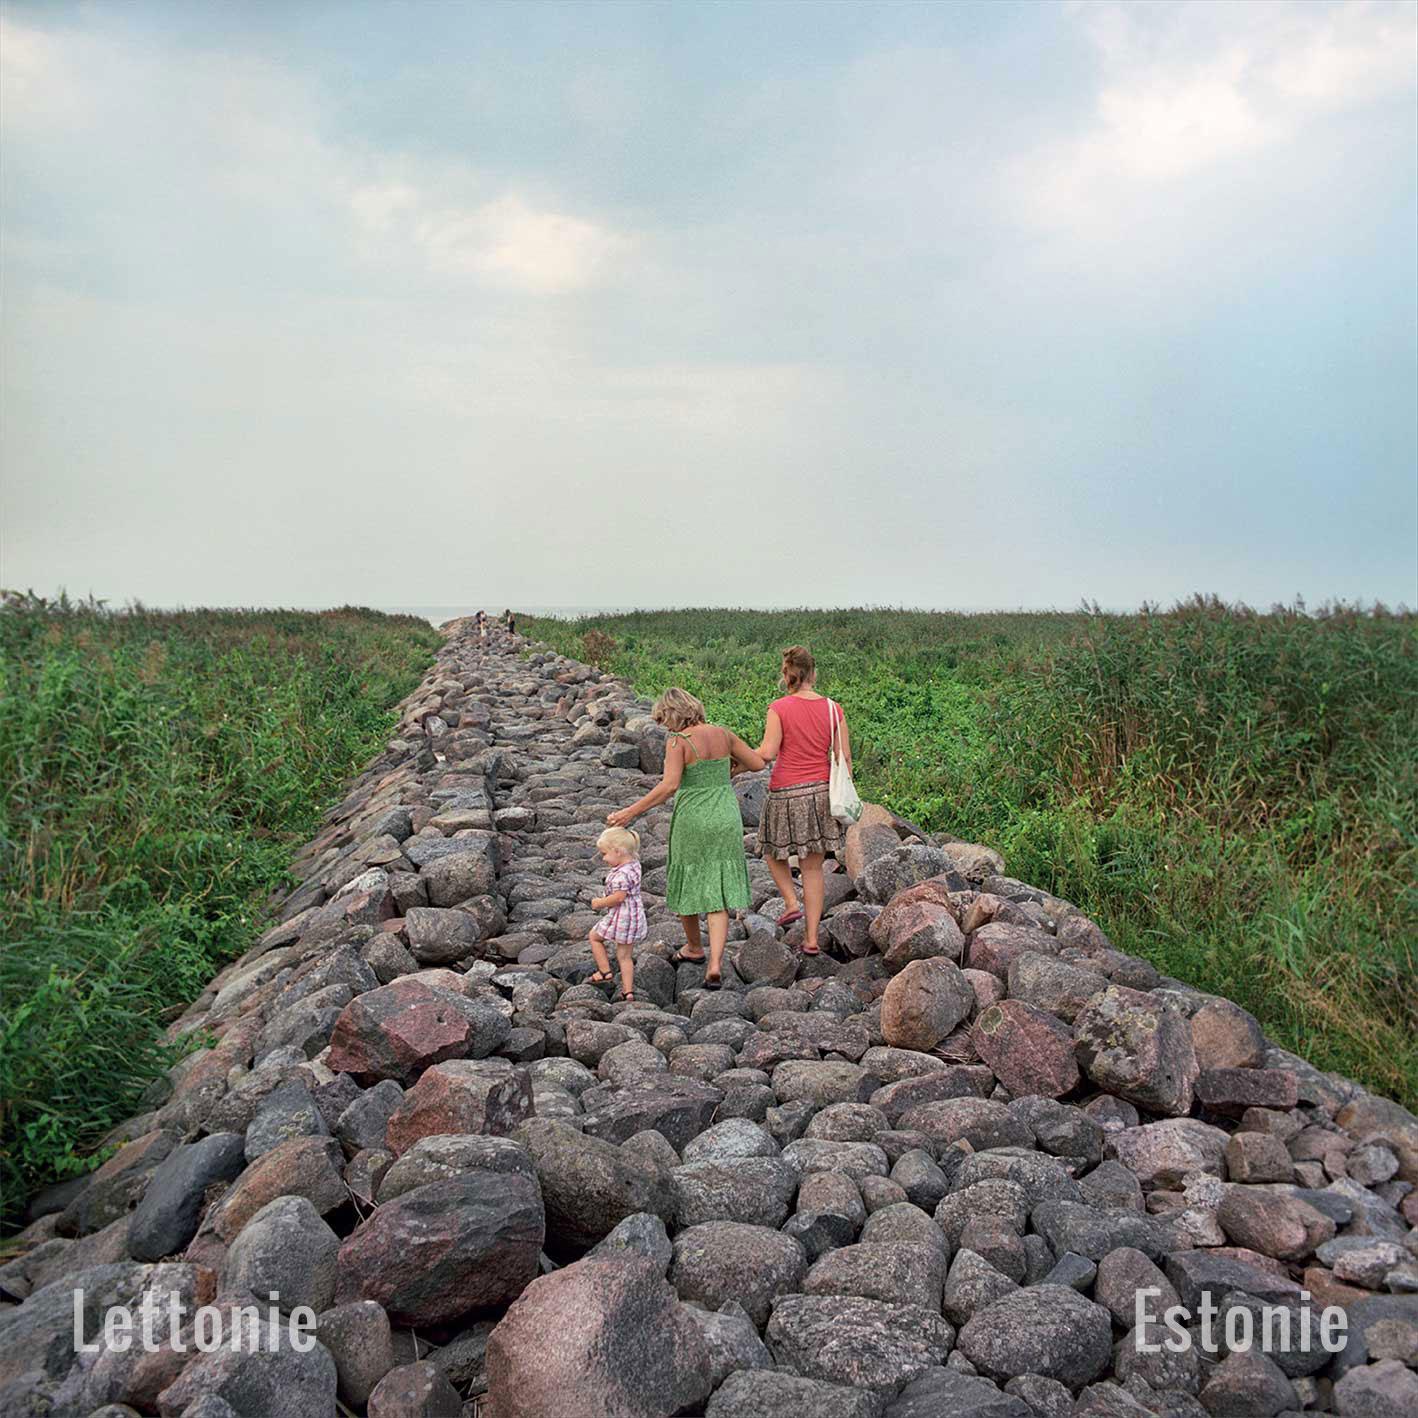 Lettonie / Estonie